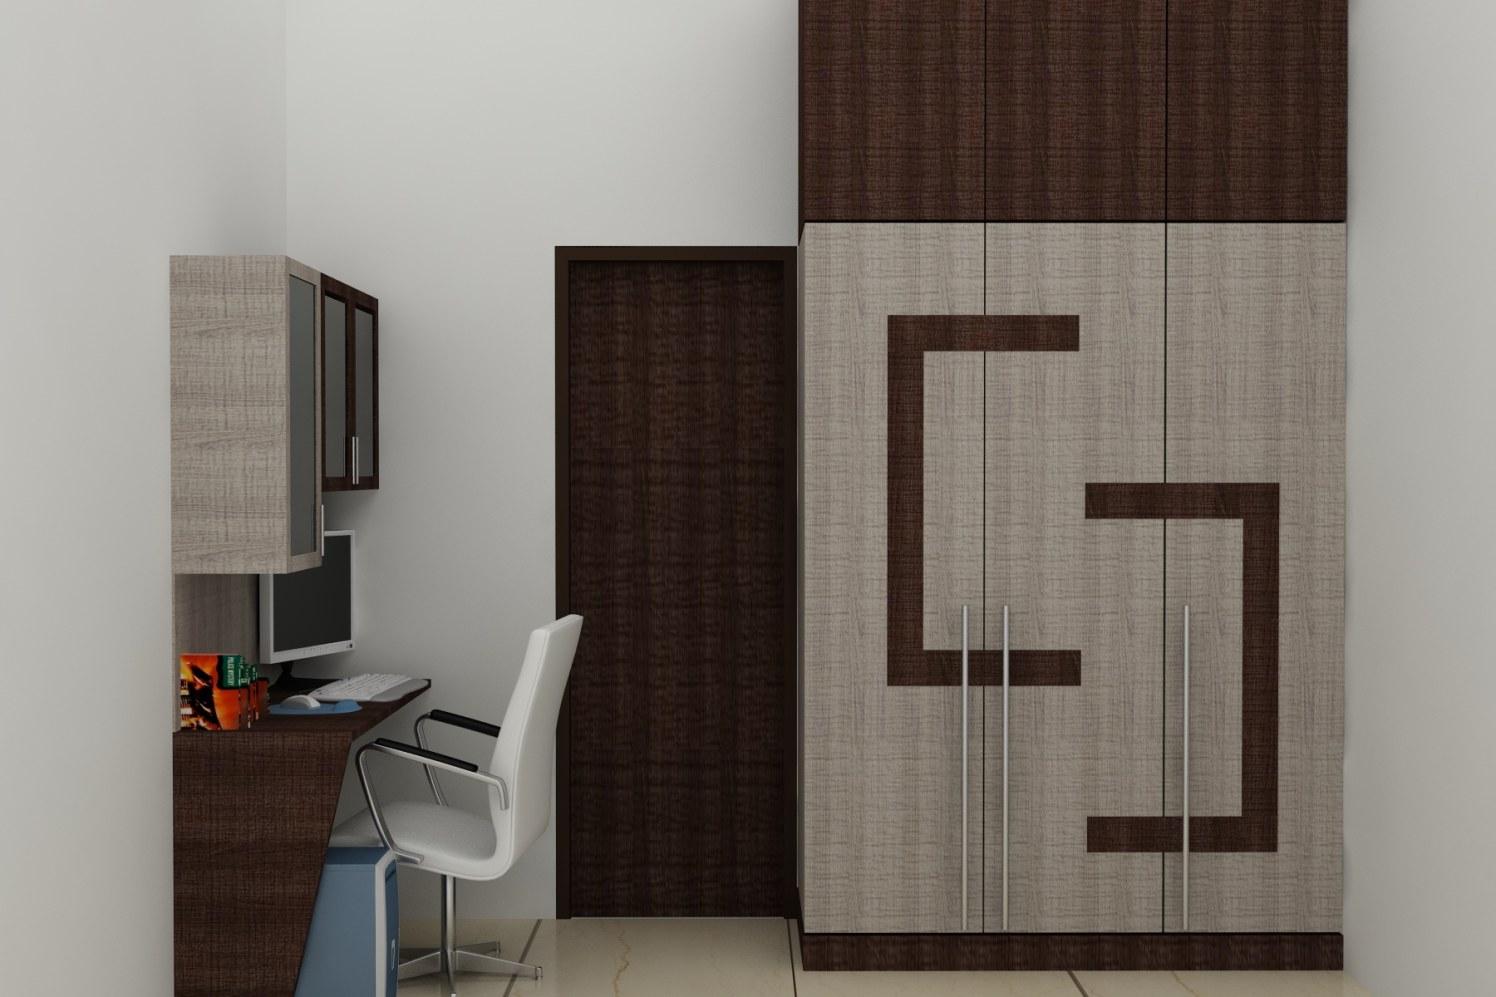 Wooden Study Table And Wardrobe In Bedroom by Vinod Sharma S Bedroom Contemporary | Interior Design Photos & Ideas